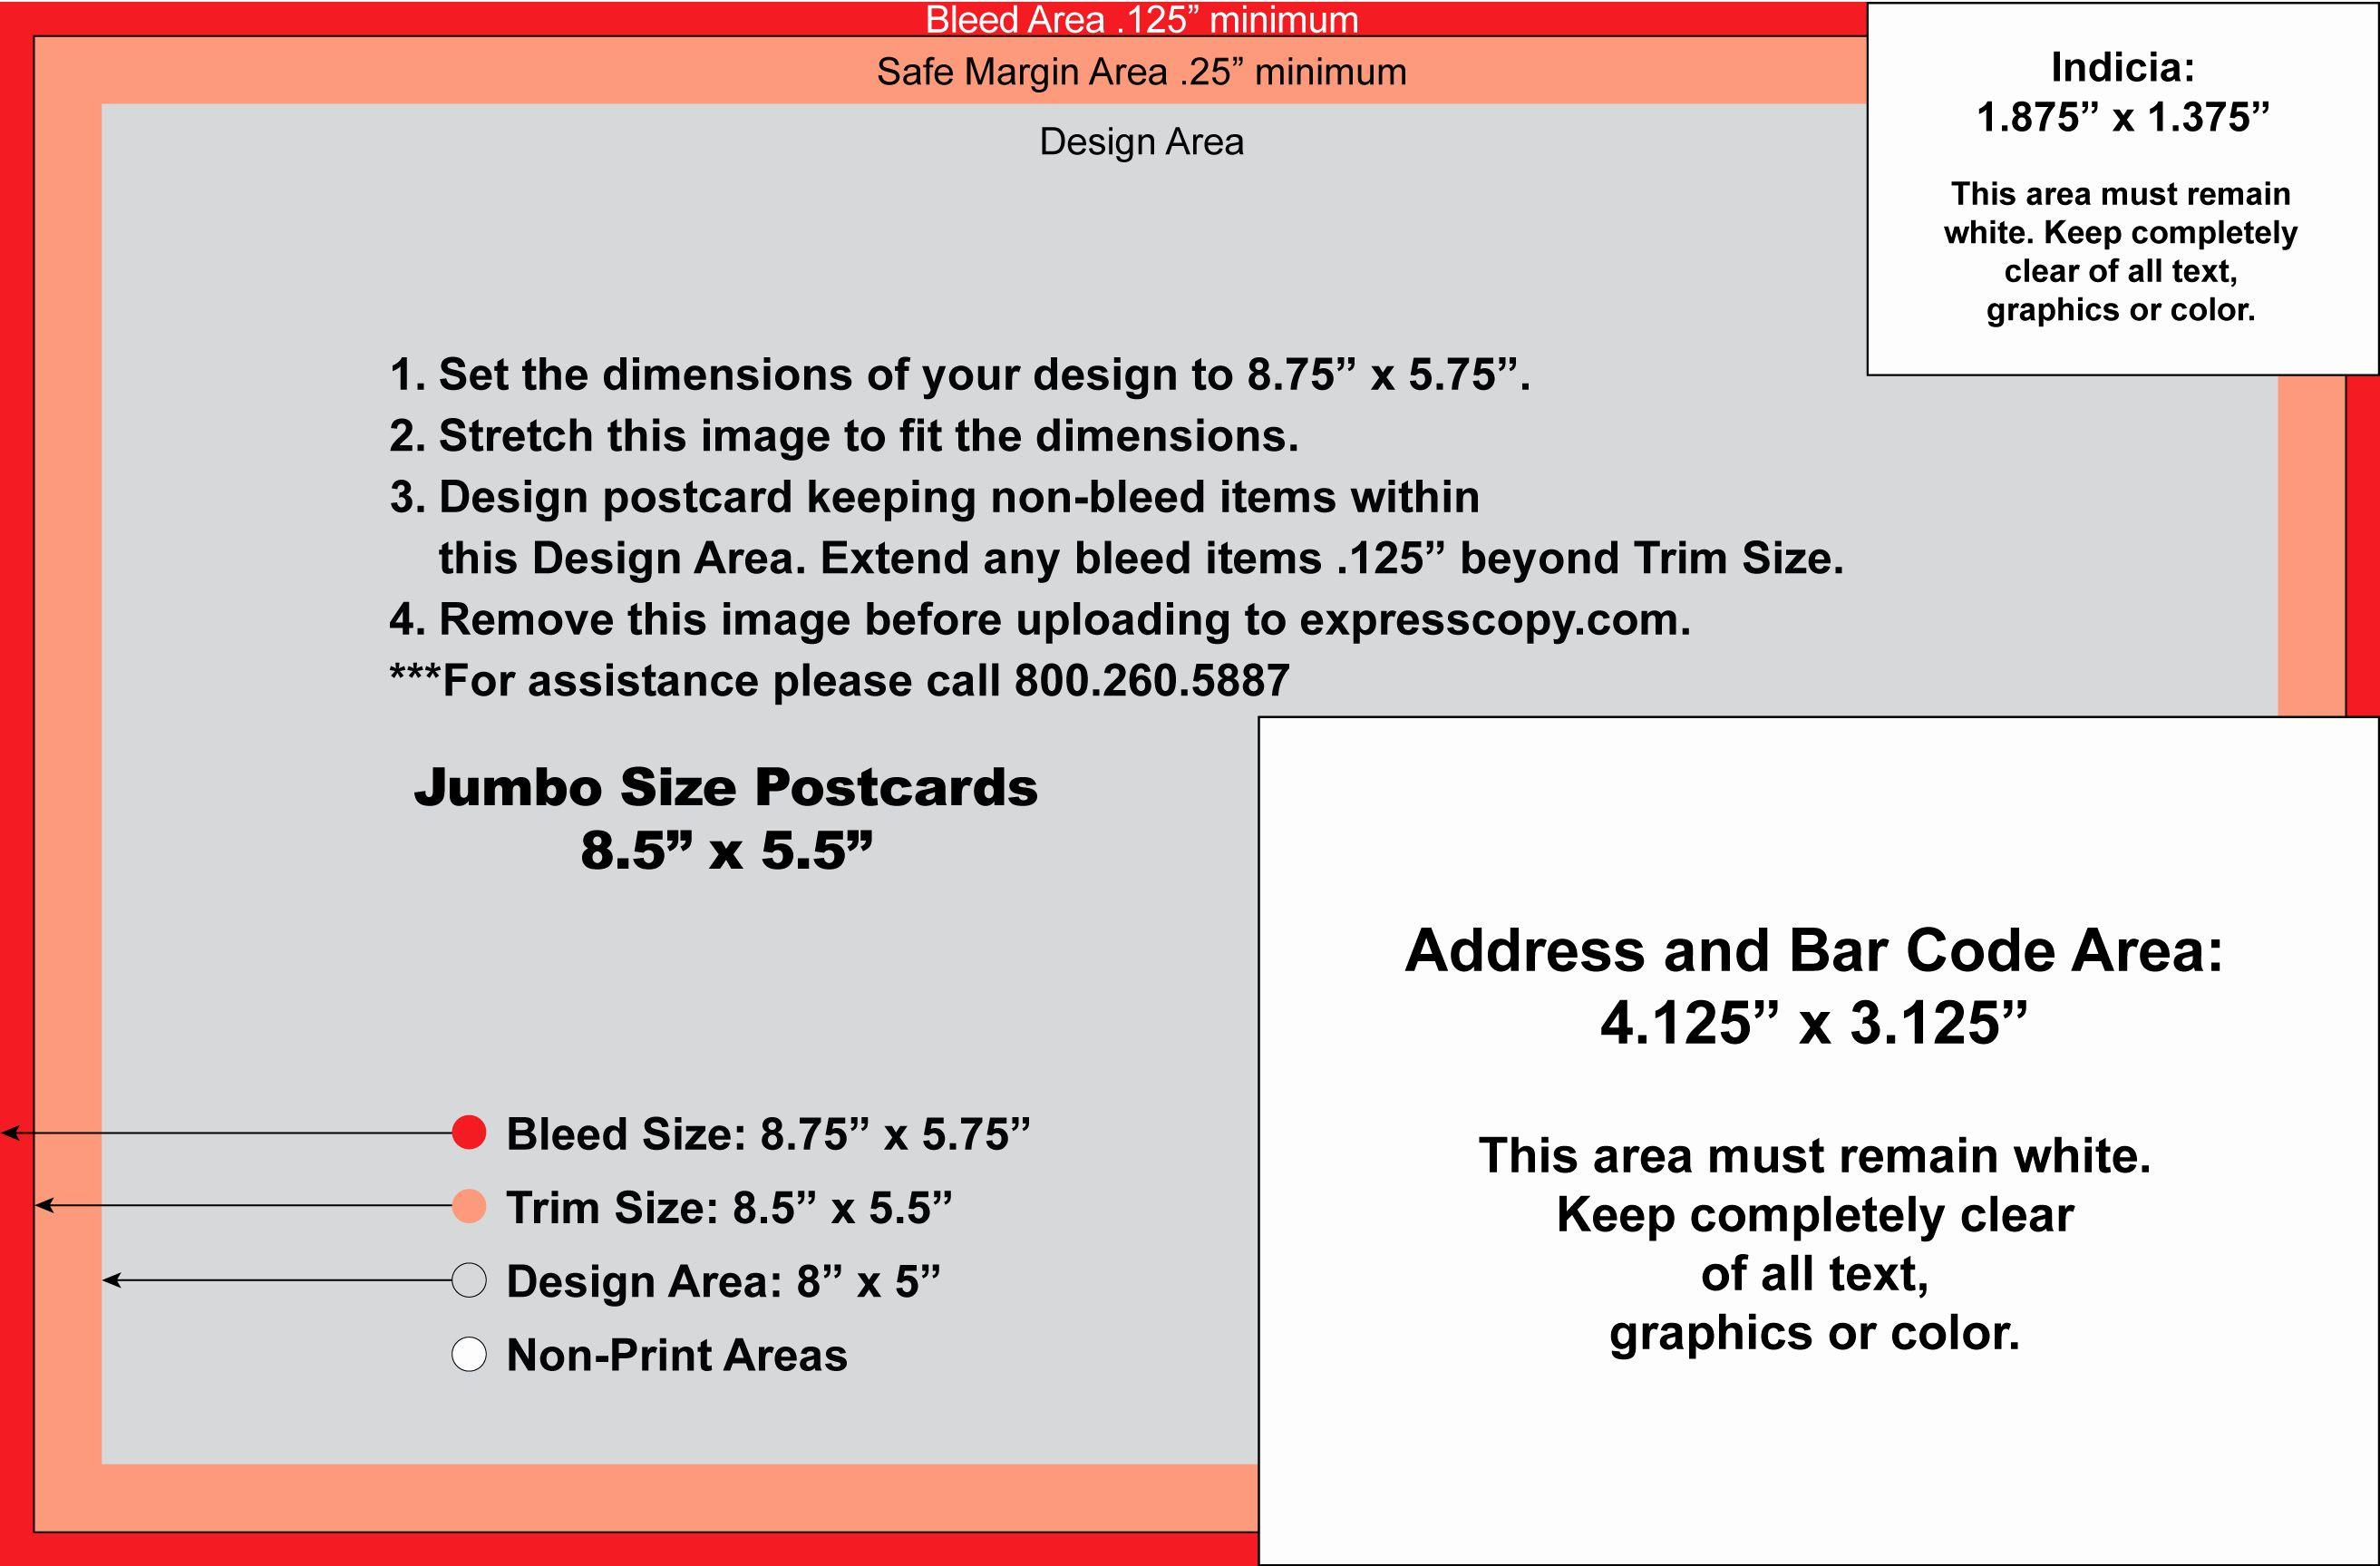 Back Of Postcard Template New Postcard Specifications Postcard Postal Regulations Free Business Card Templates Postcard Template Business Card Template